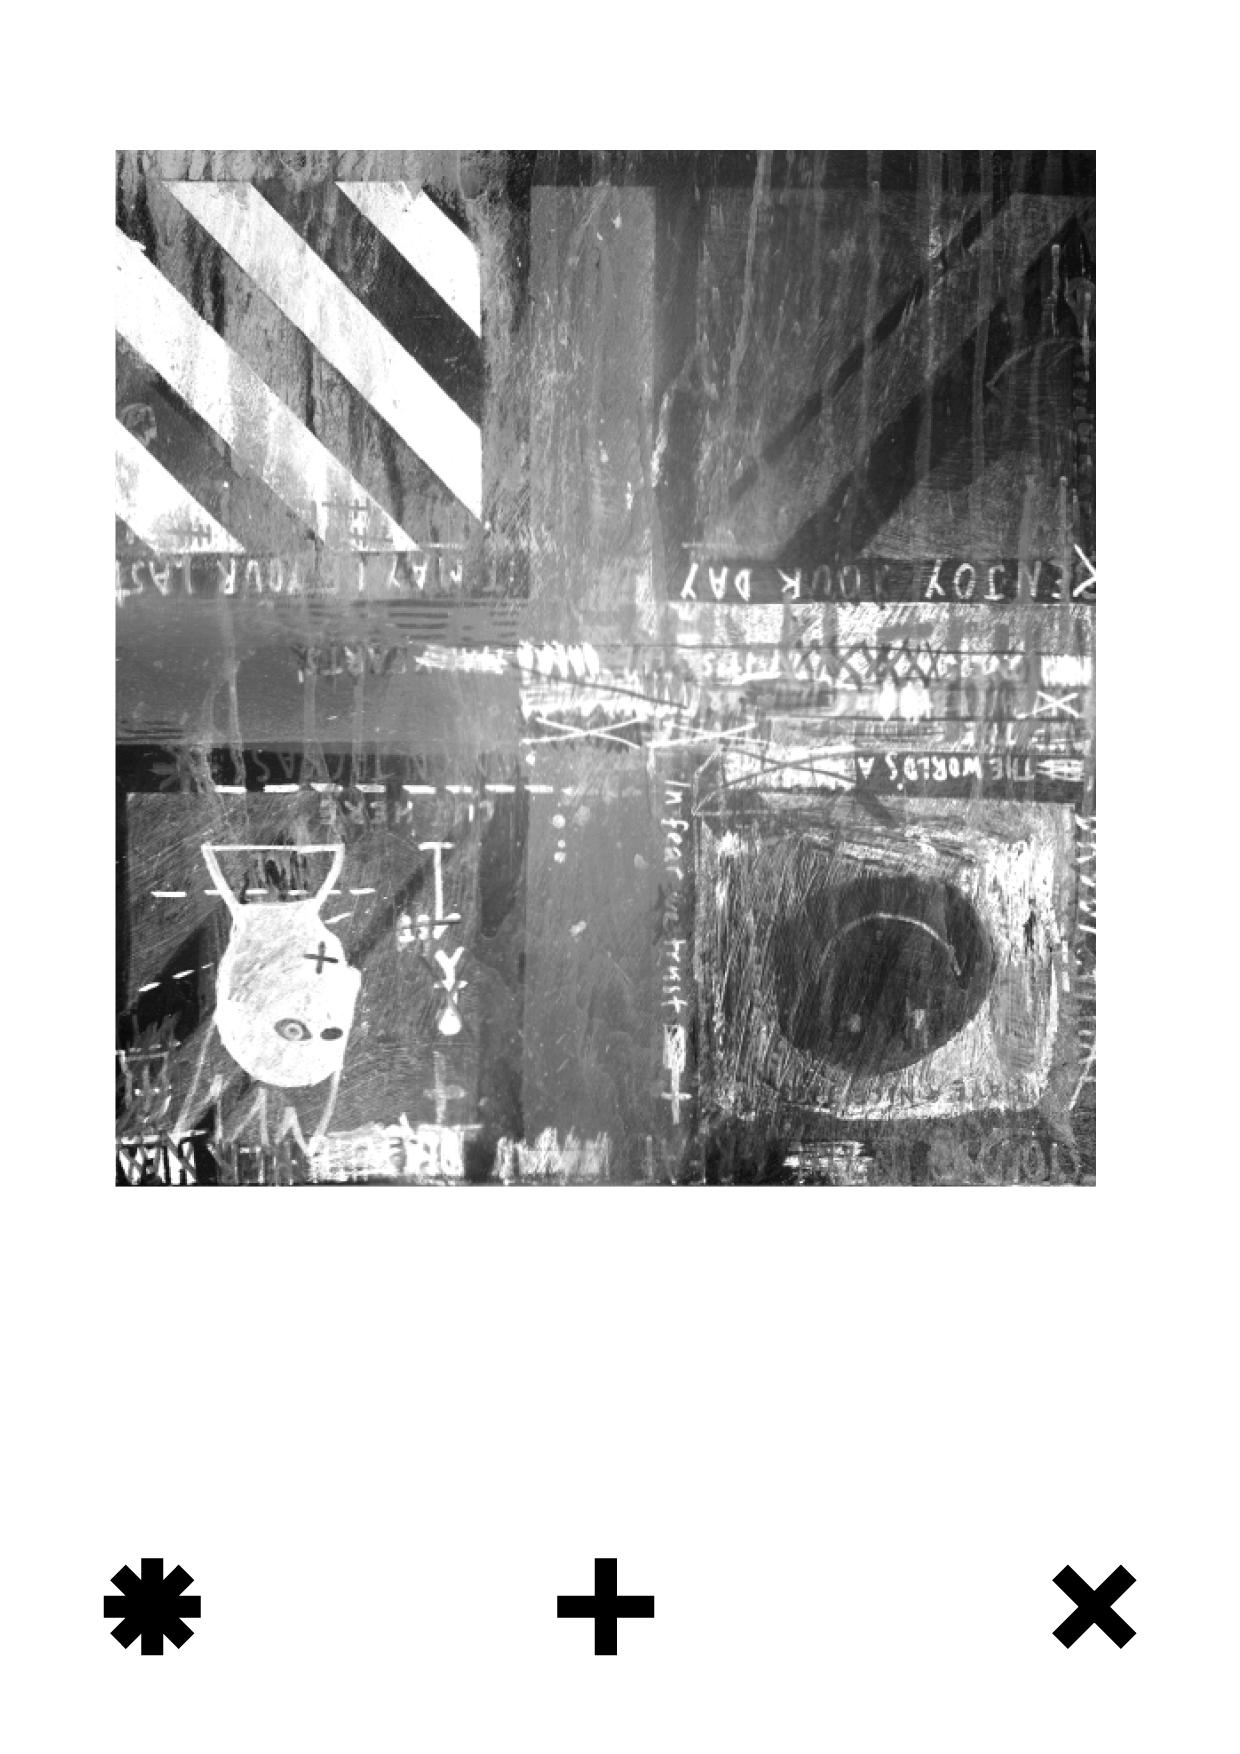 SNUFF ZINE-foxes-multistorey22.jpg